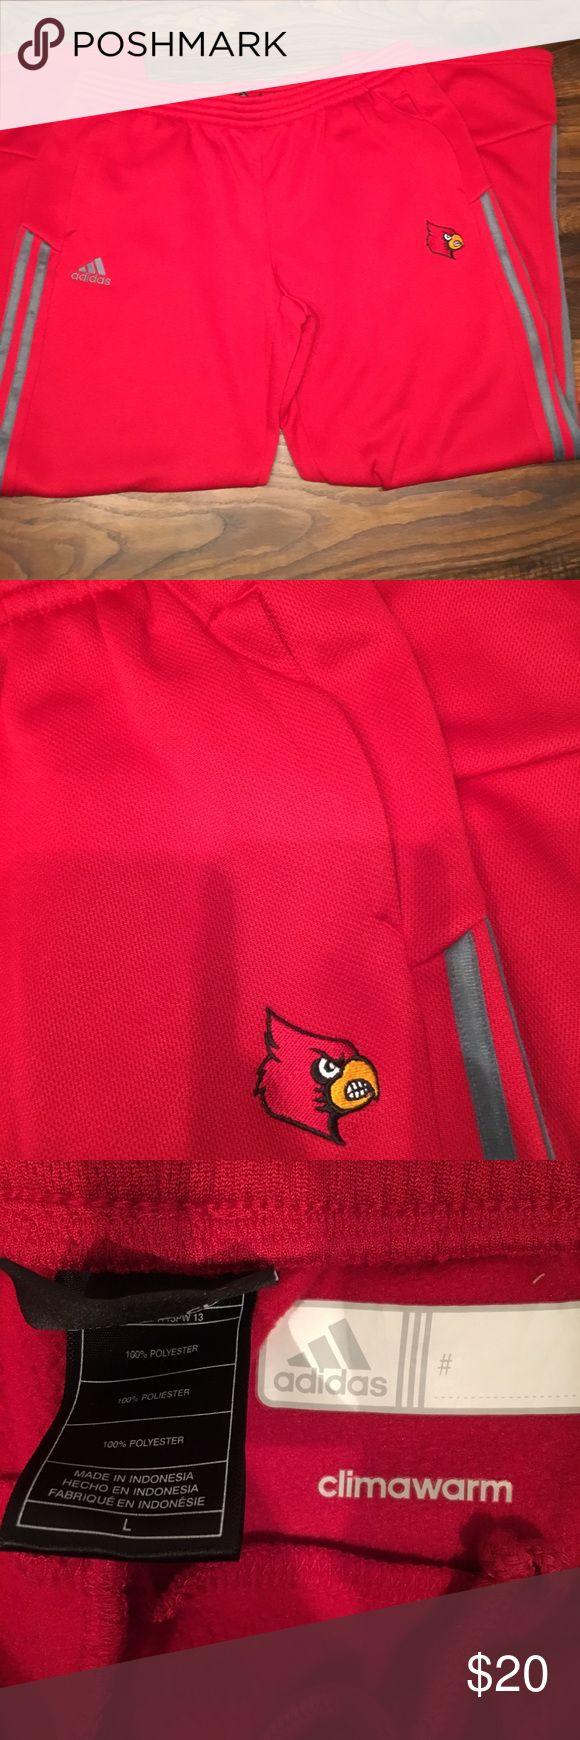 NWOT Men's Red Adidas Pants Large Sweatpants cardinals. With pockets adidas Pants Sweatpants & Joggers